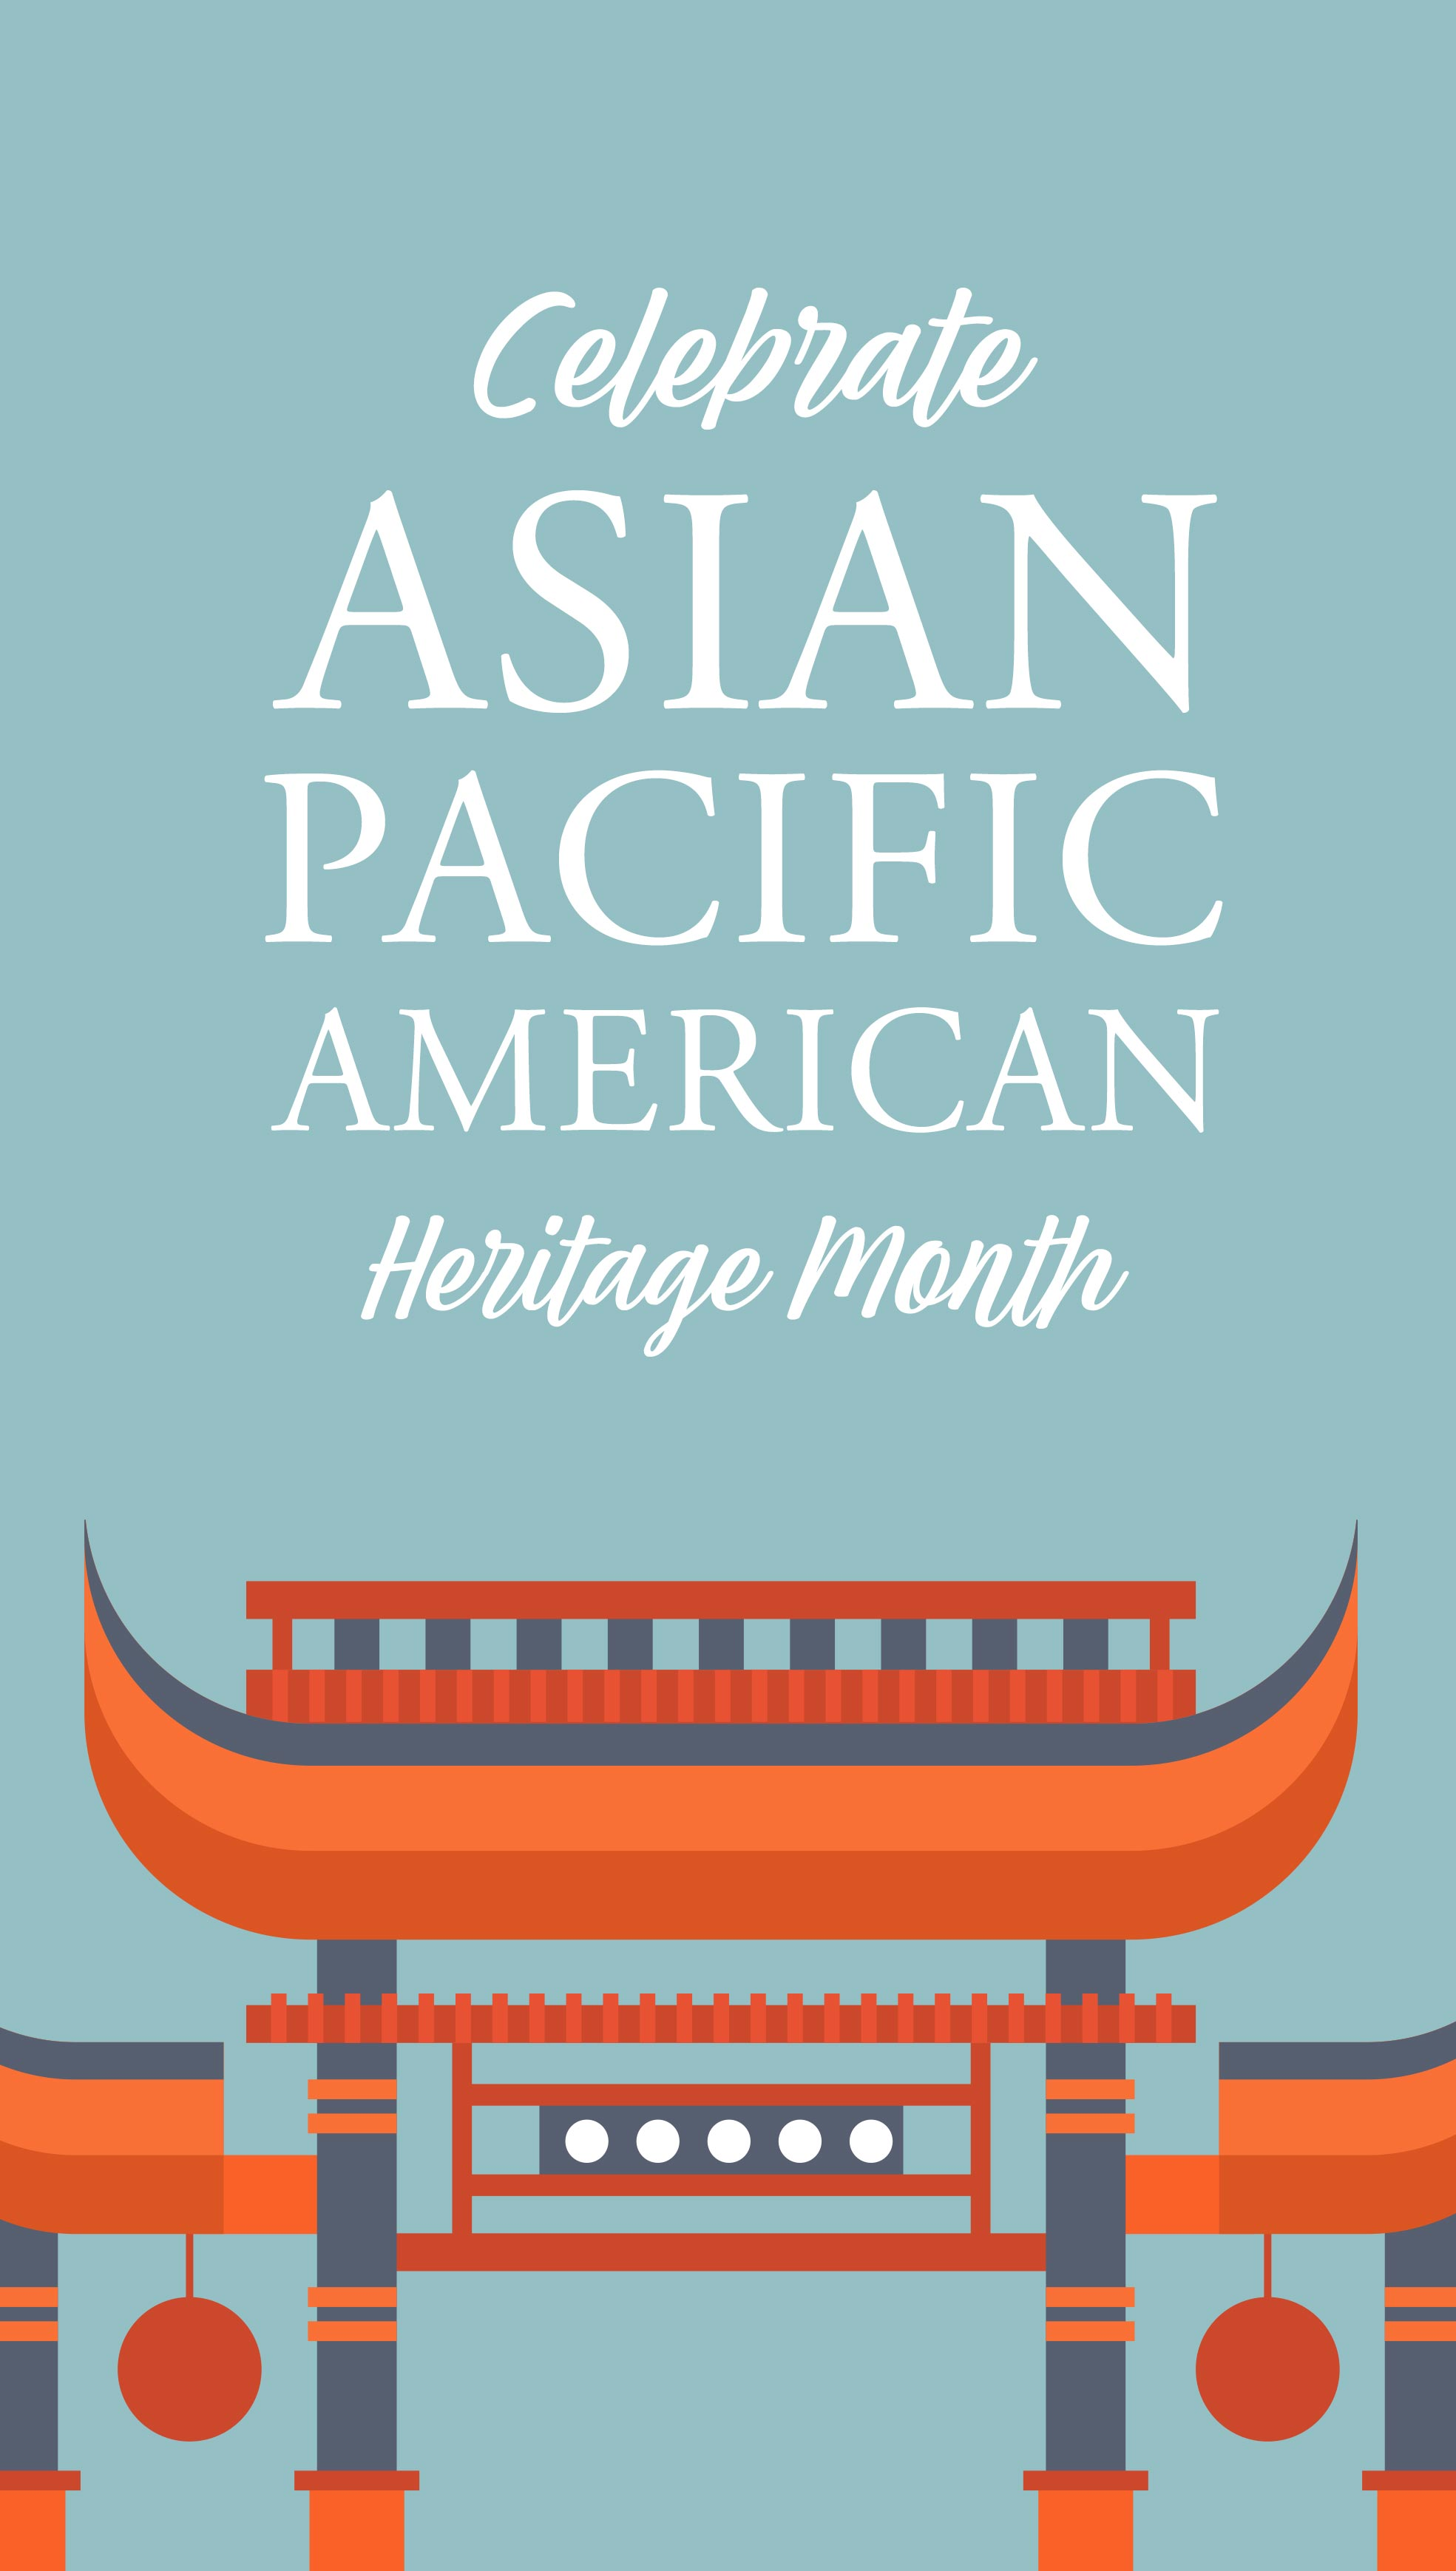 Heritage Month